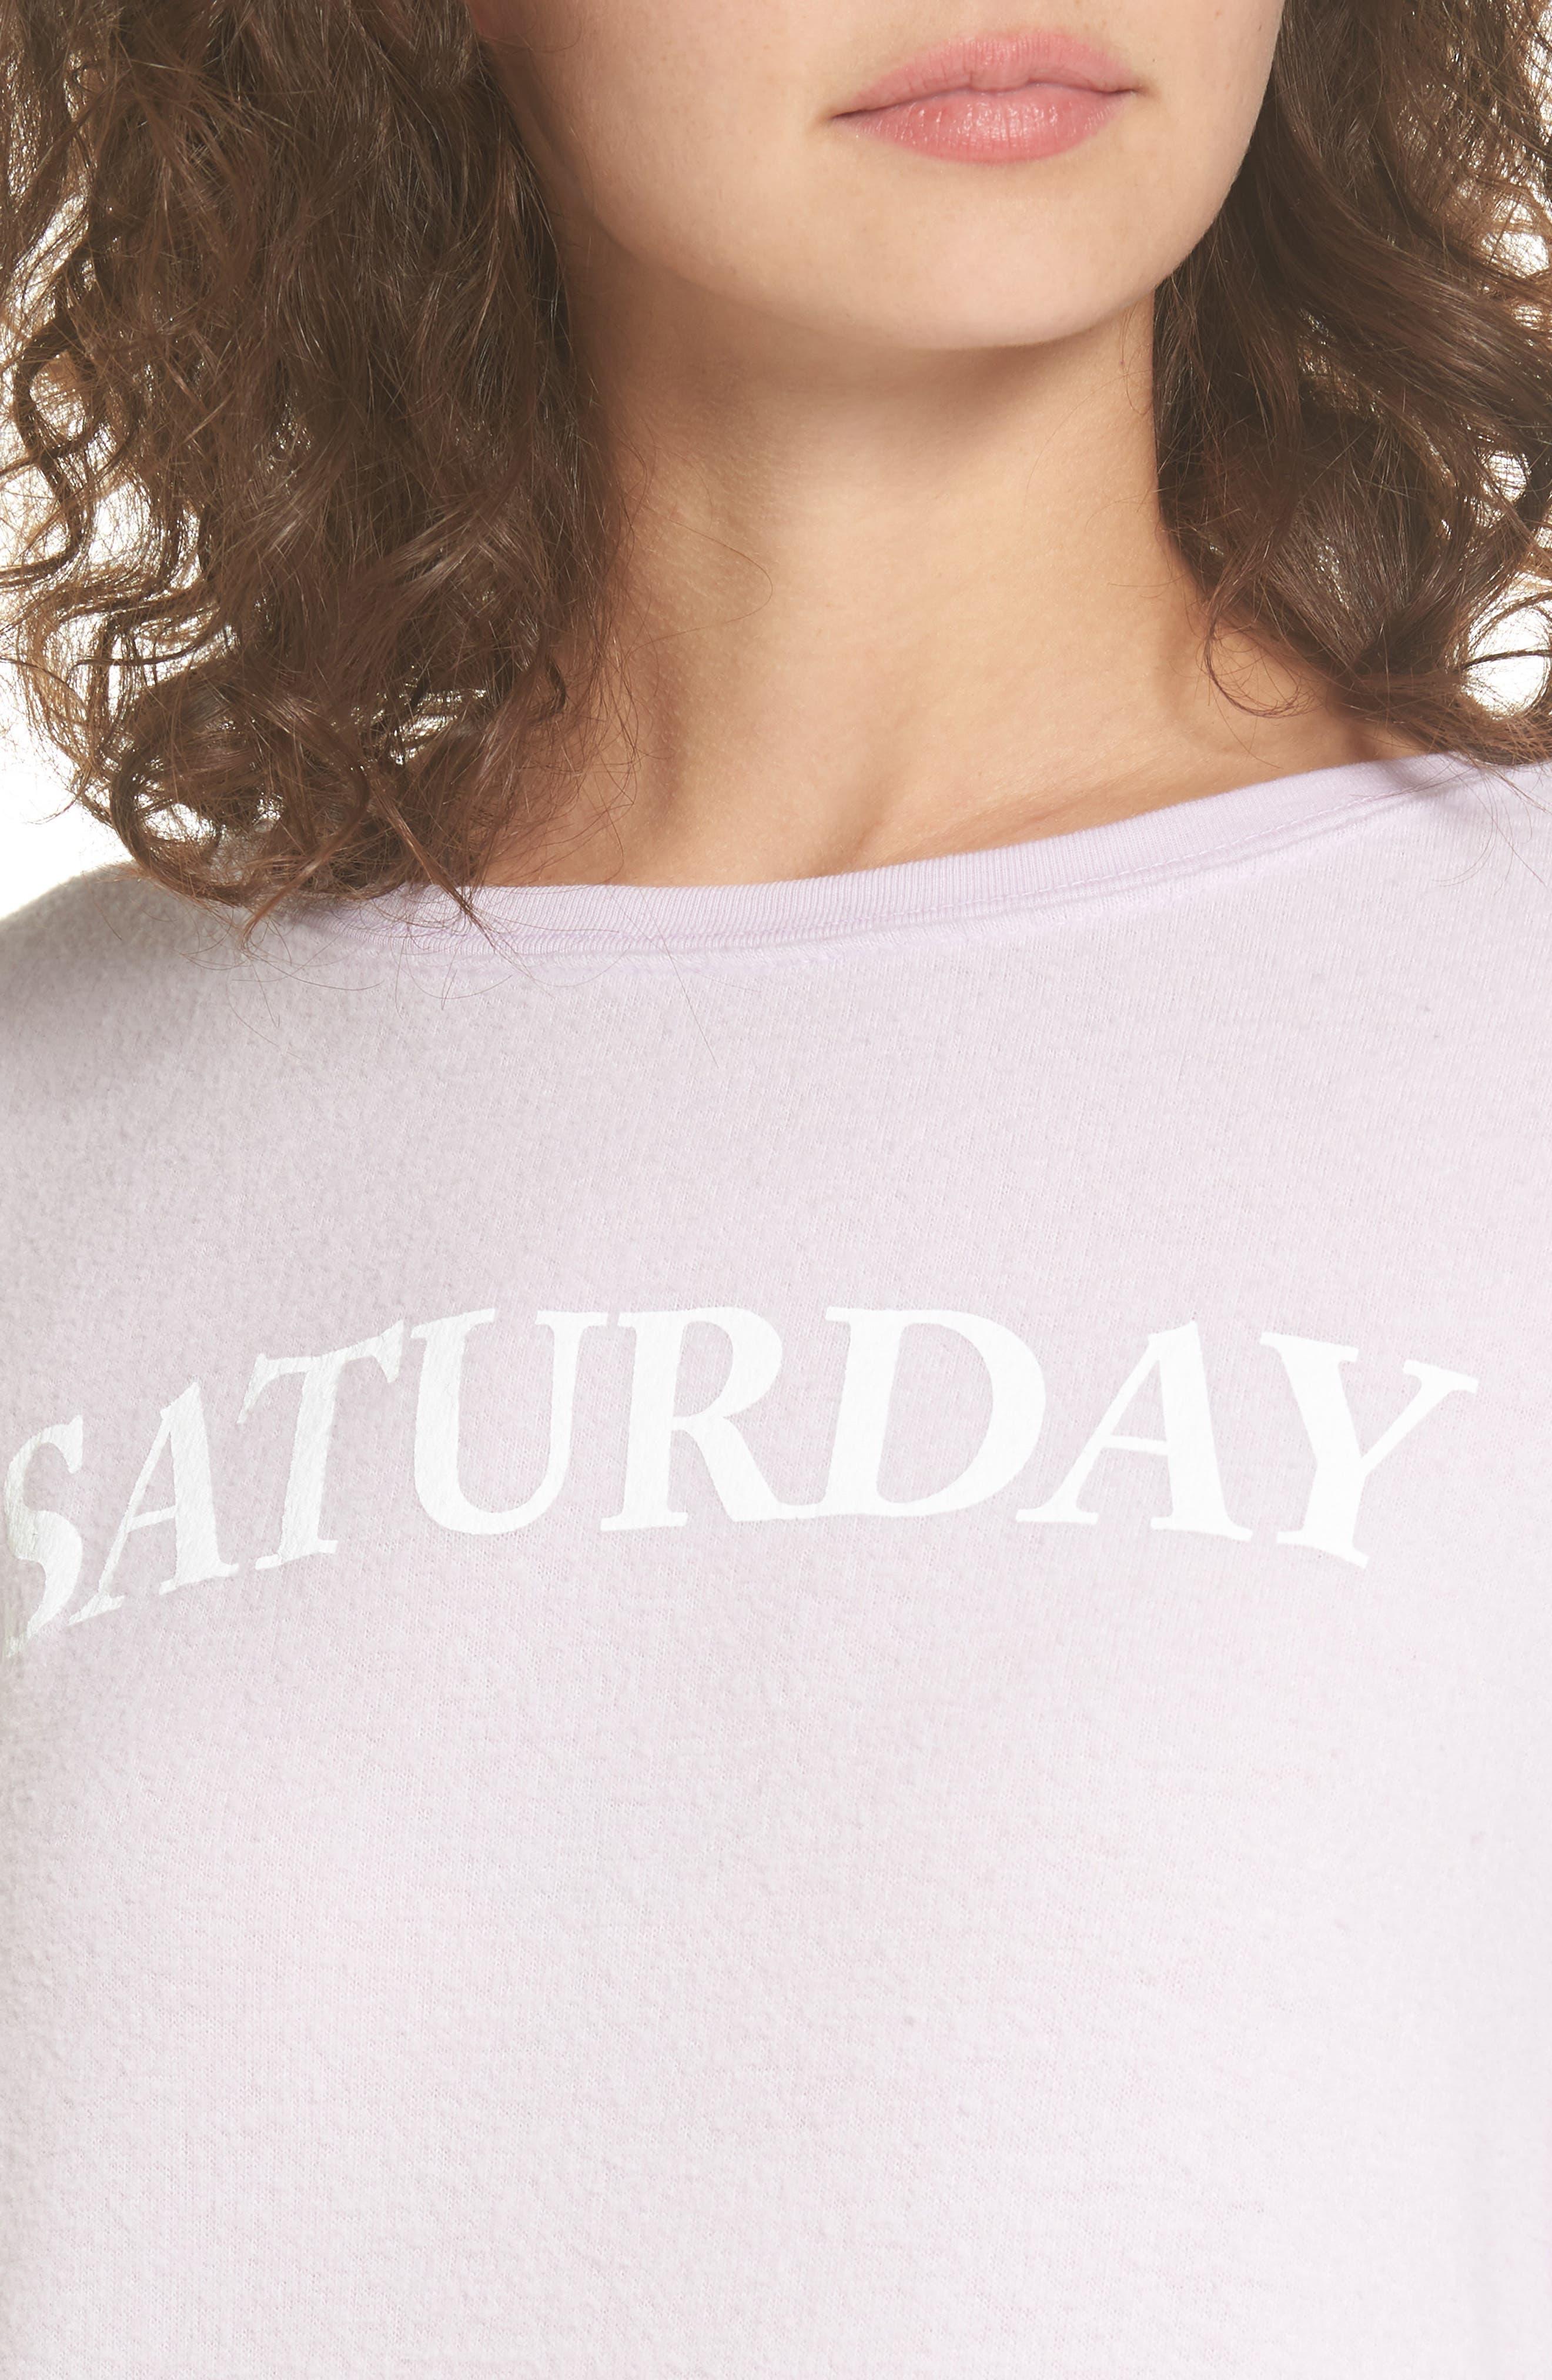 Saturday Sweatshirt,                             Alternate thumbnail 4, color,                             510